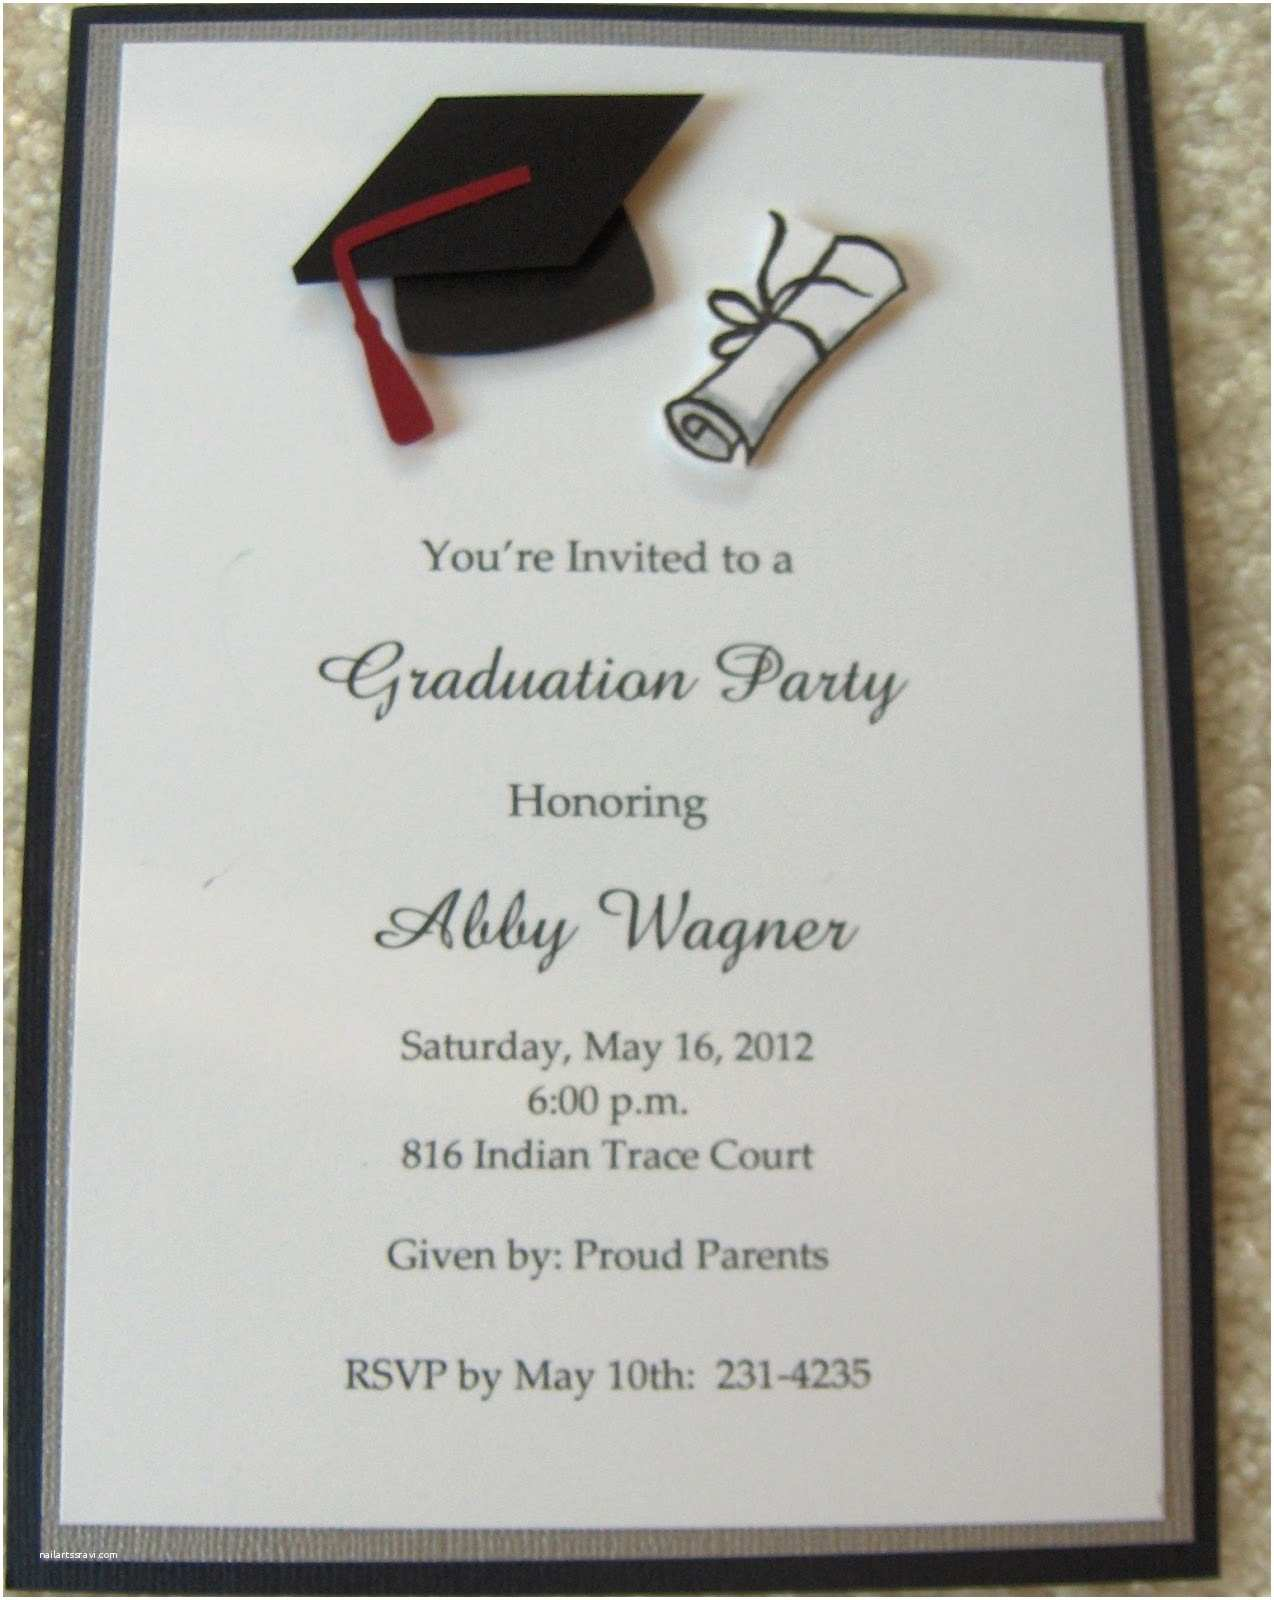 Sample Graduation Invitation Sample Invitation Card for Graduation Ceremony Gallery